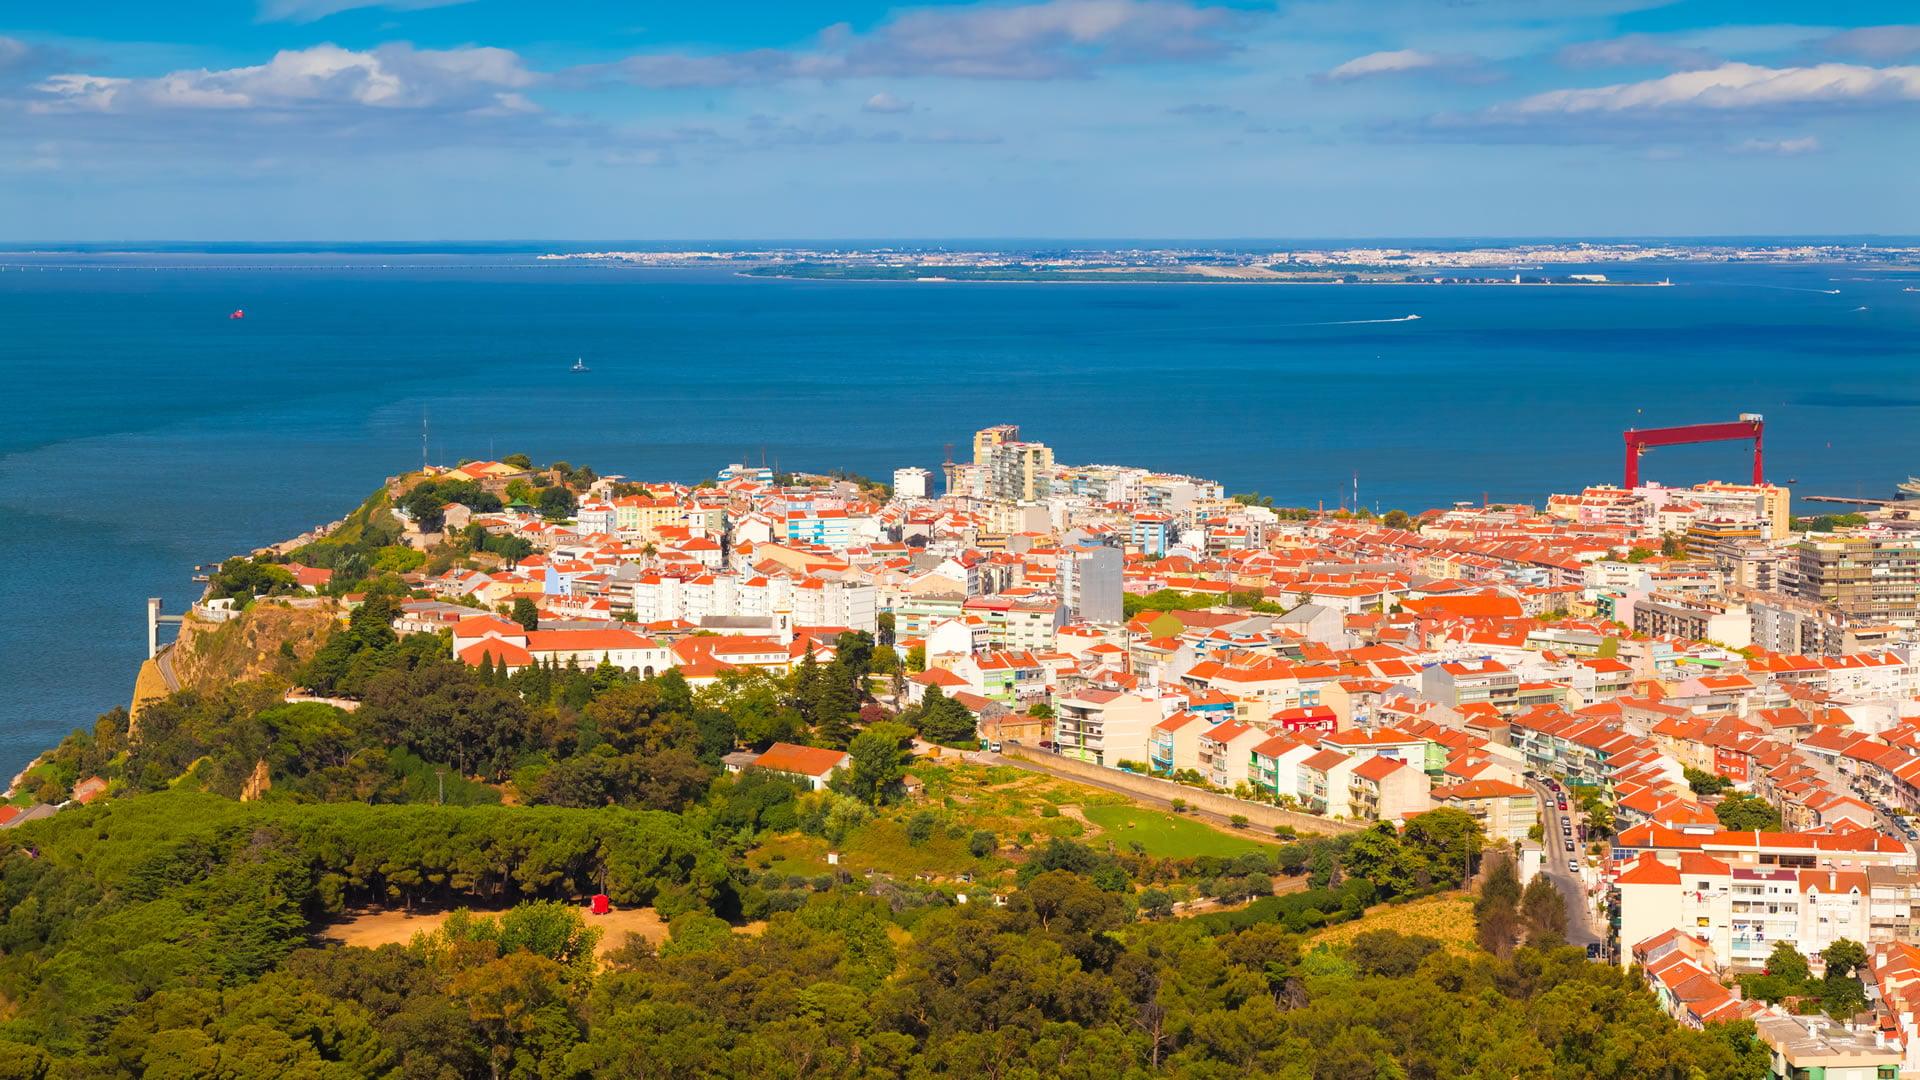 Almada Portugal  city pictures gallery : Vista aérea de Almada, Portugal